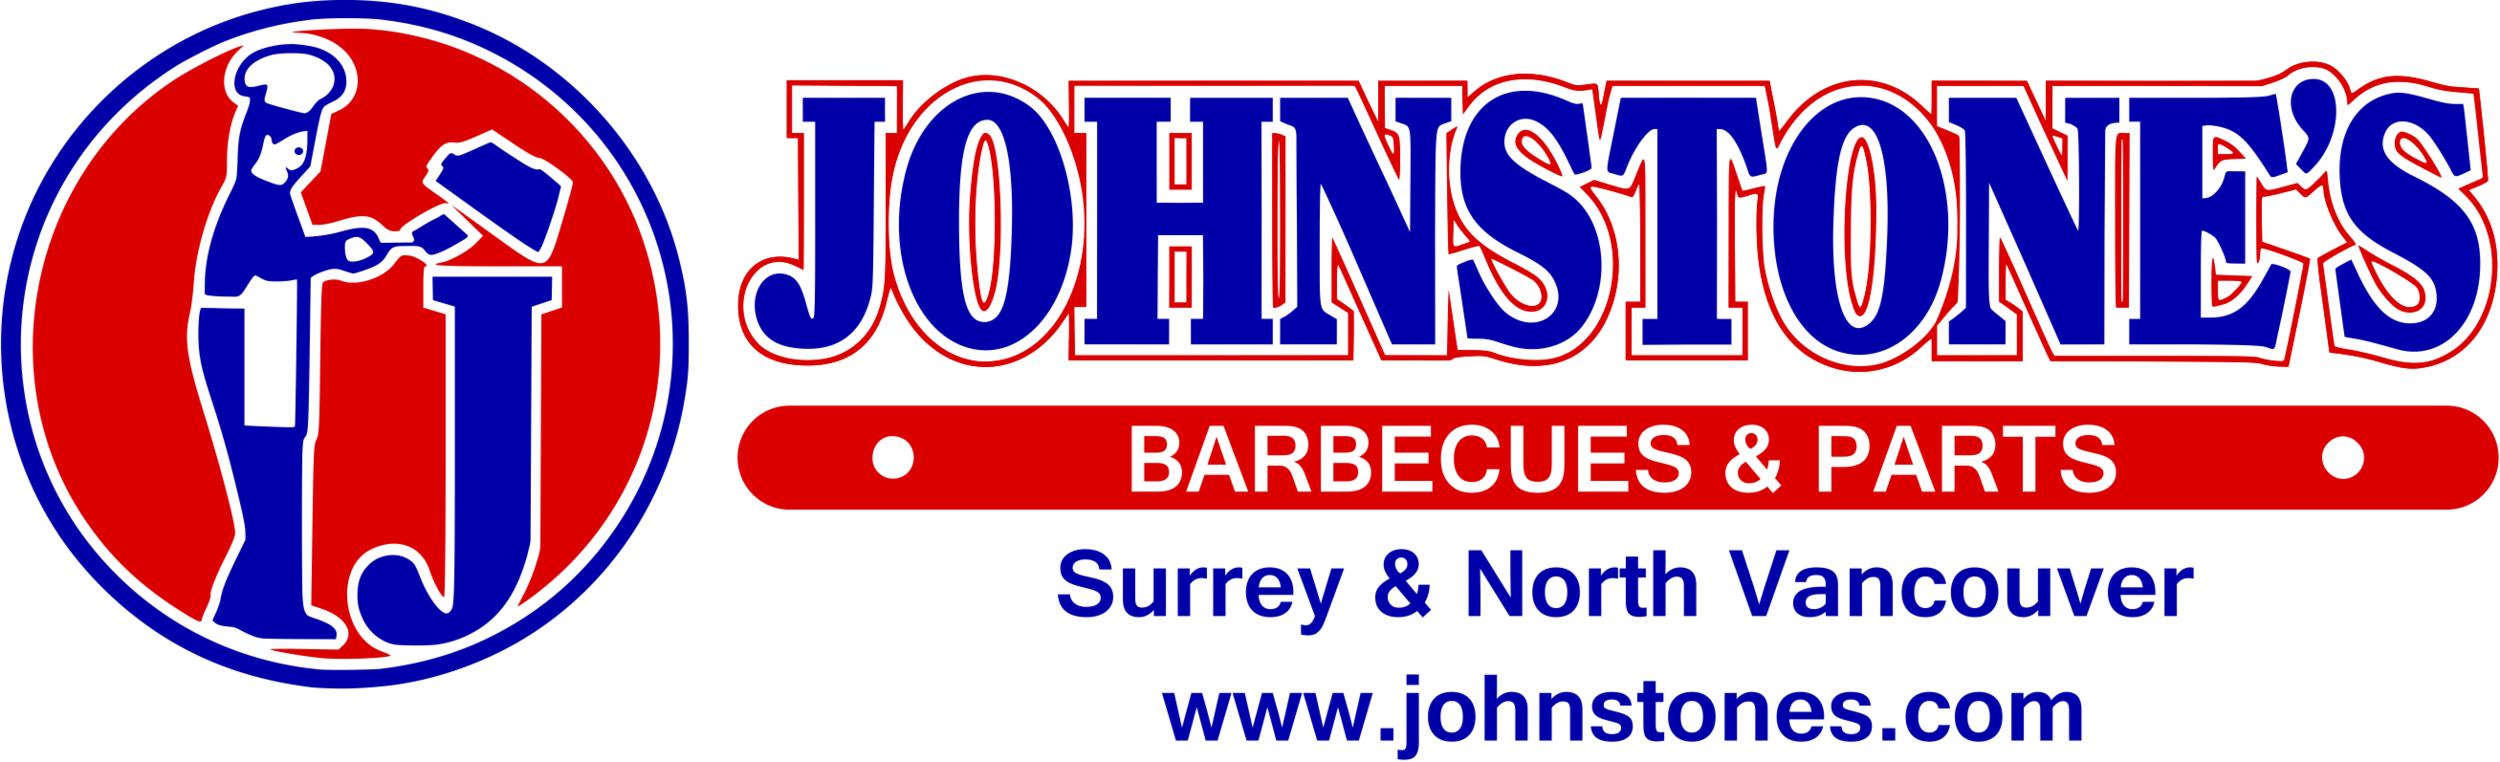 johnstones_logo_rf.png